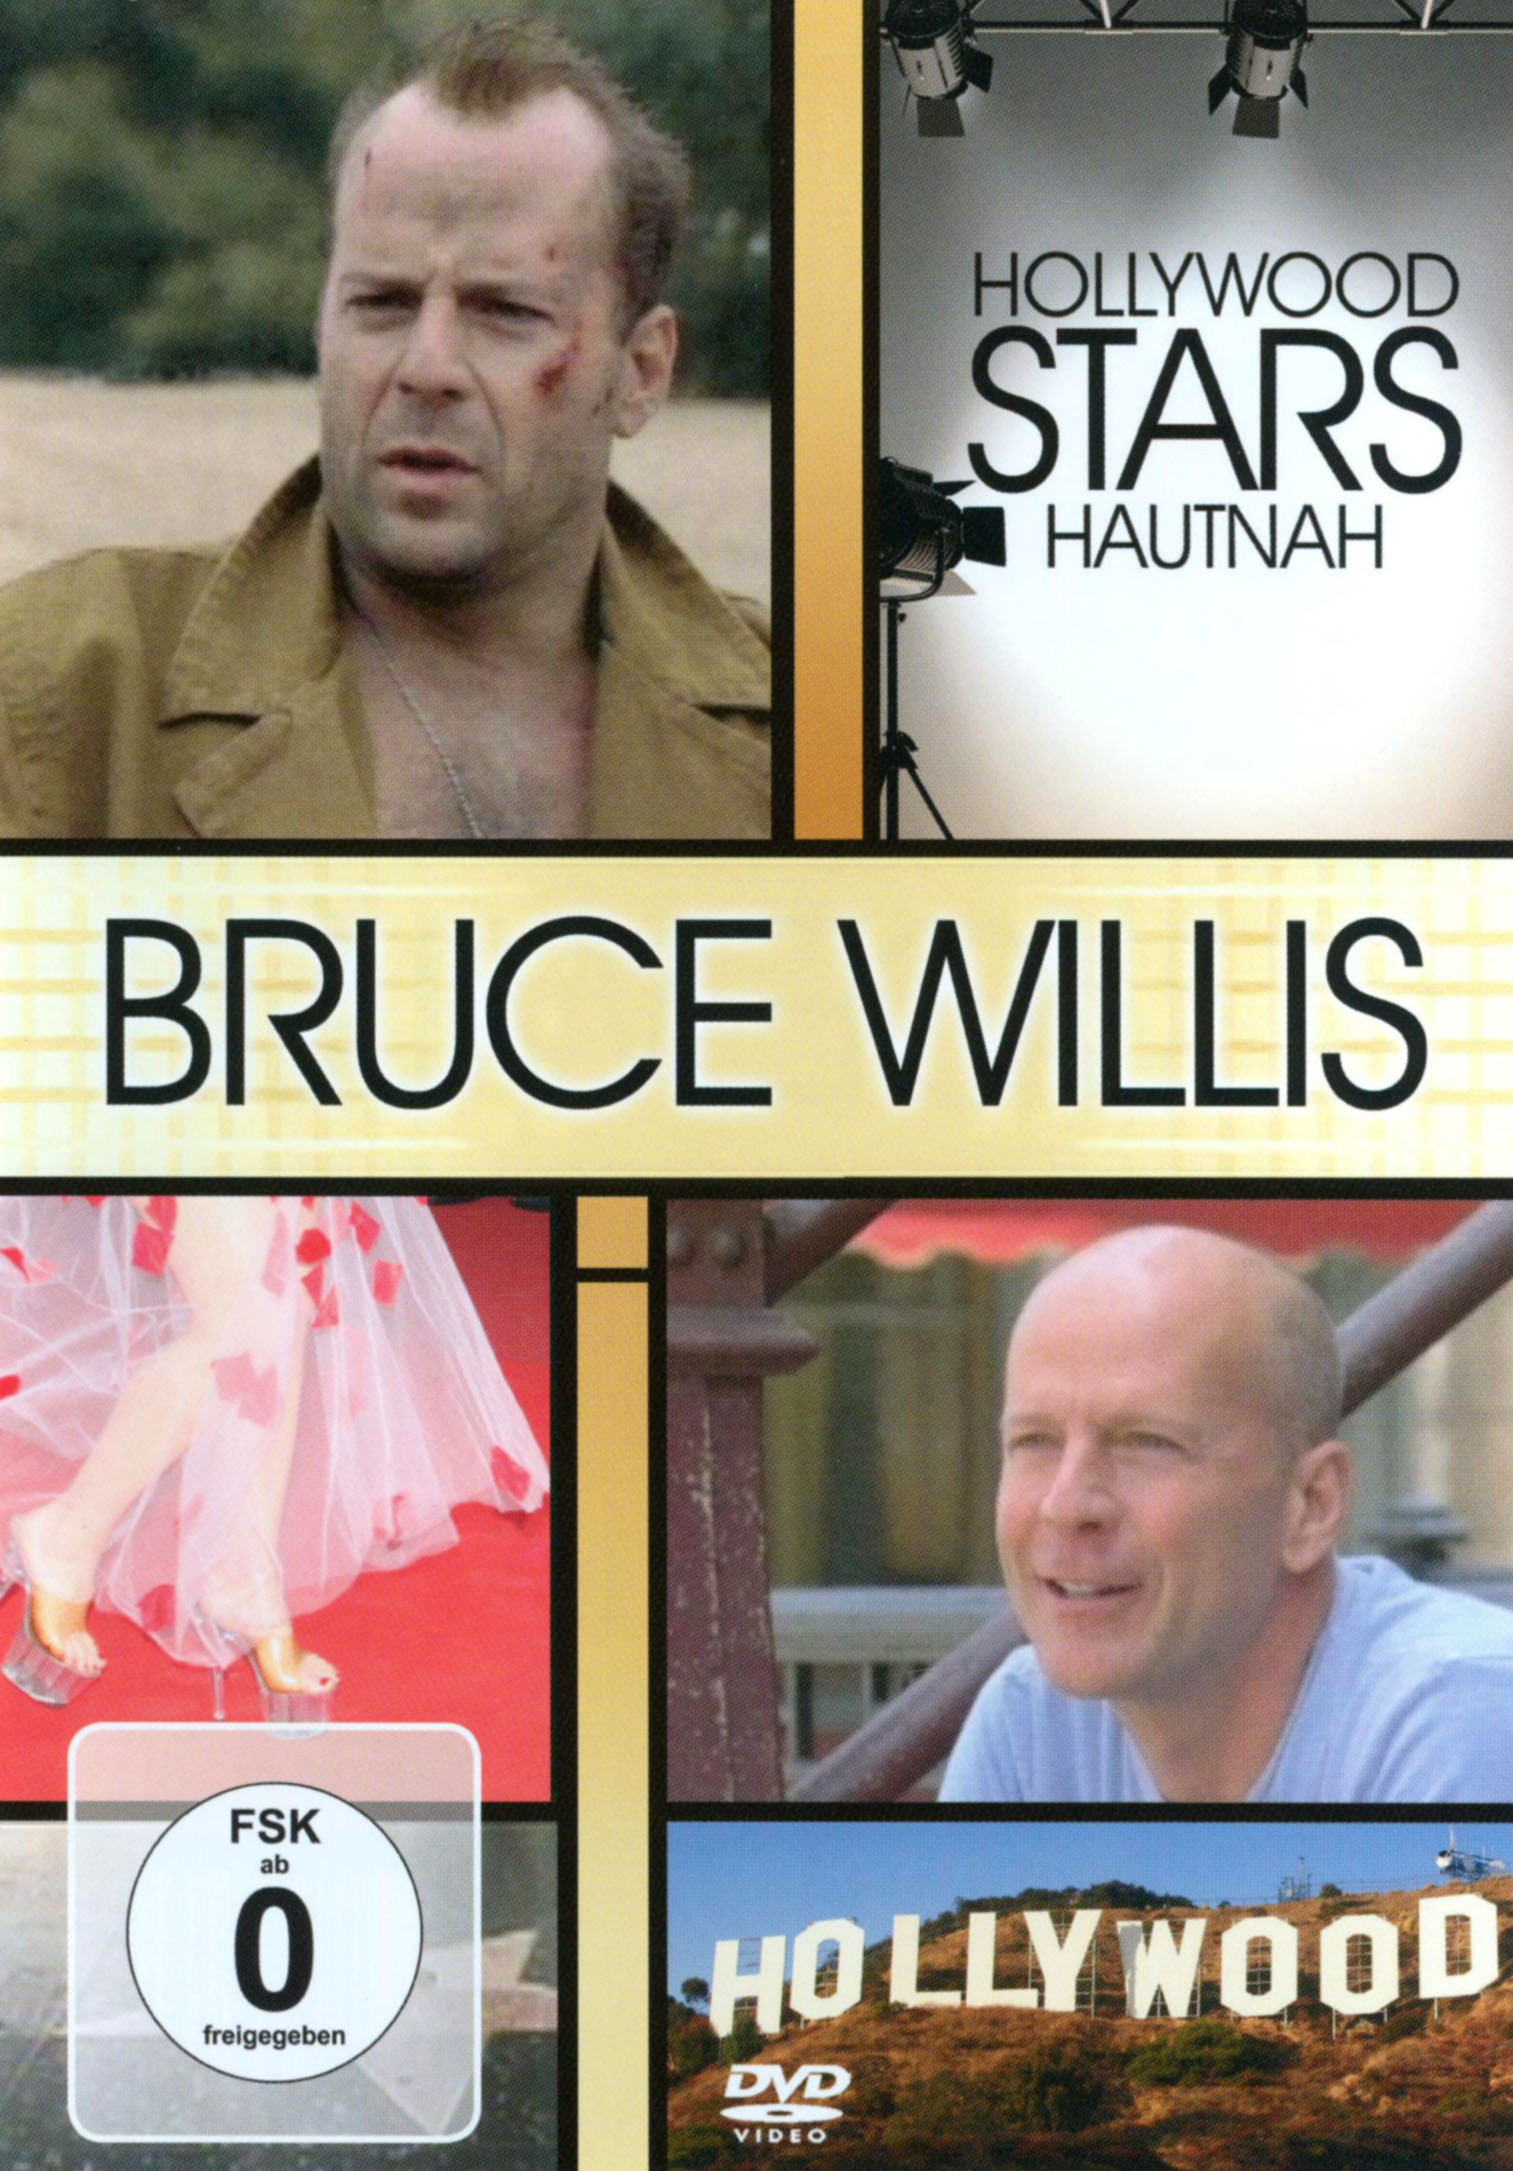 Hollywood Stars Hautnah: Bruce Willis